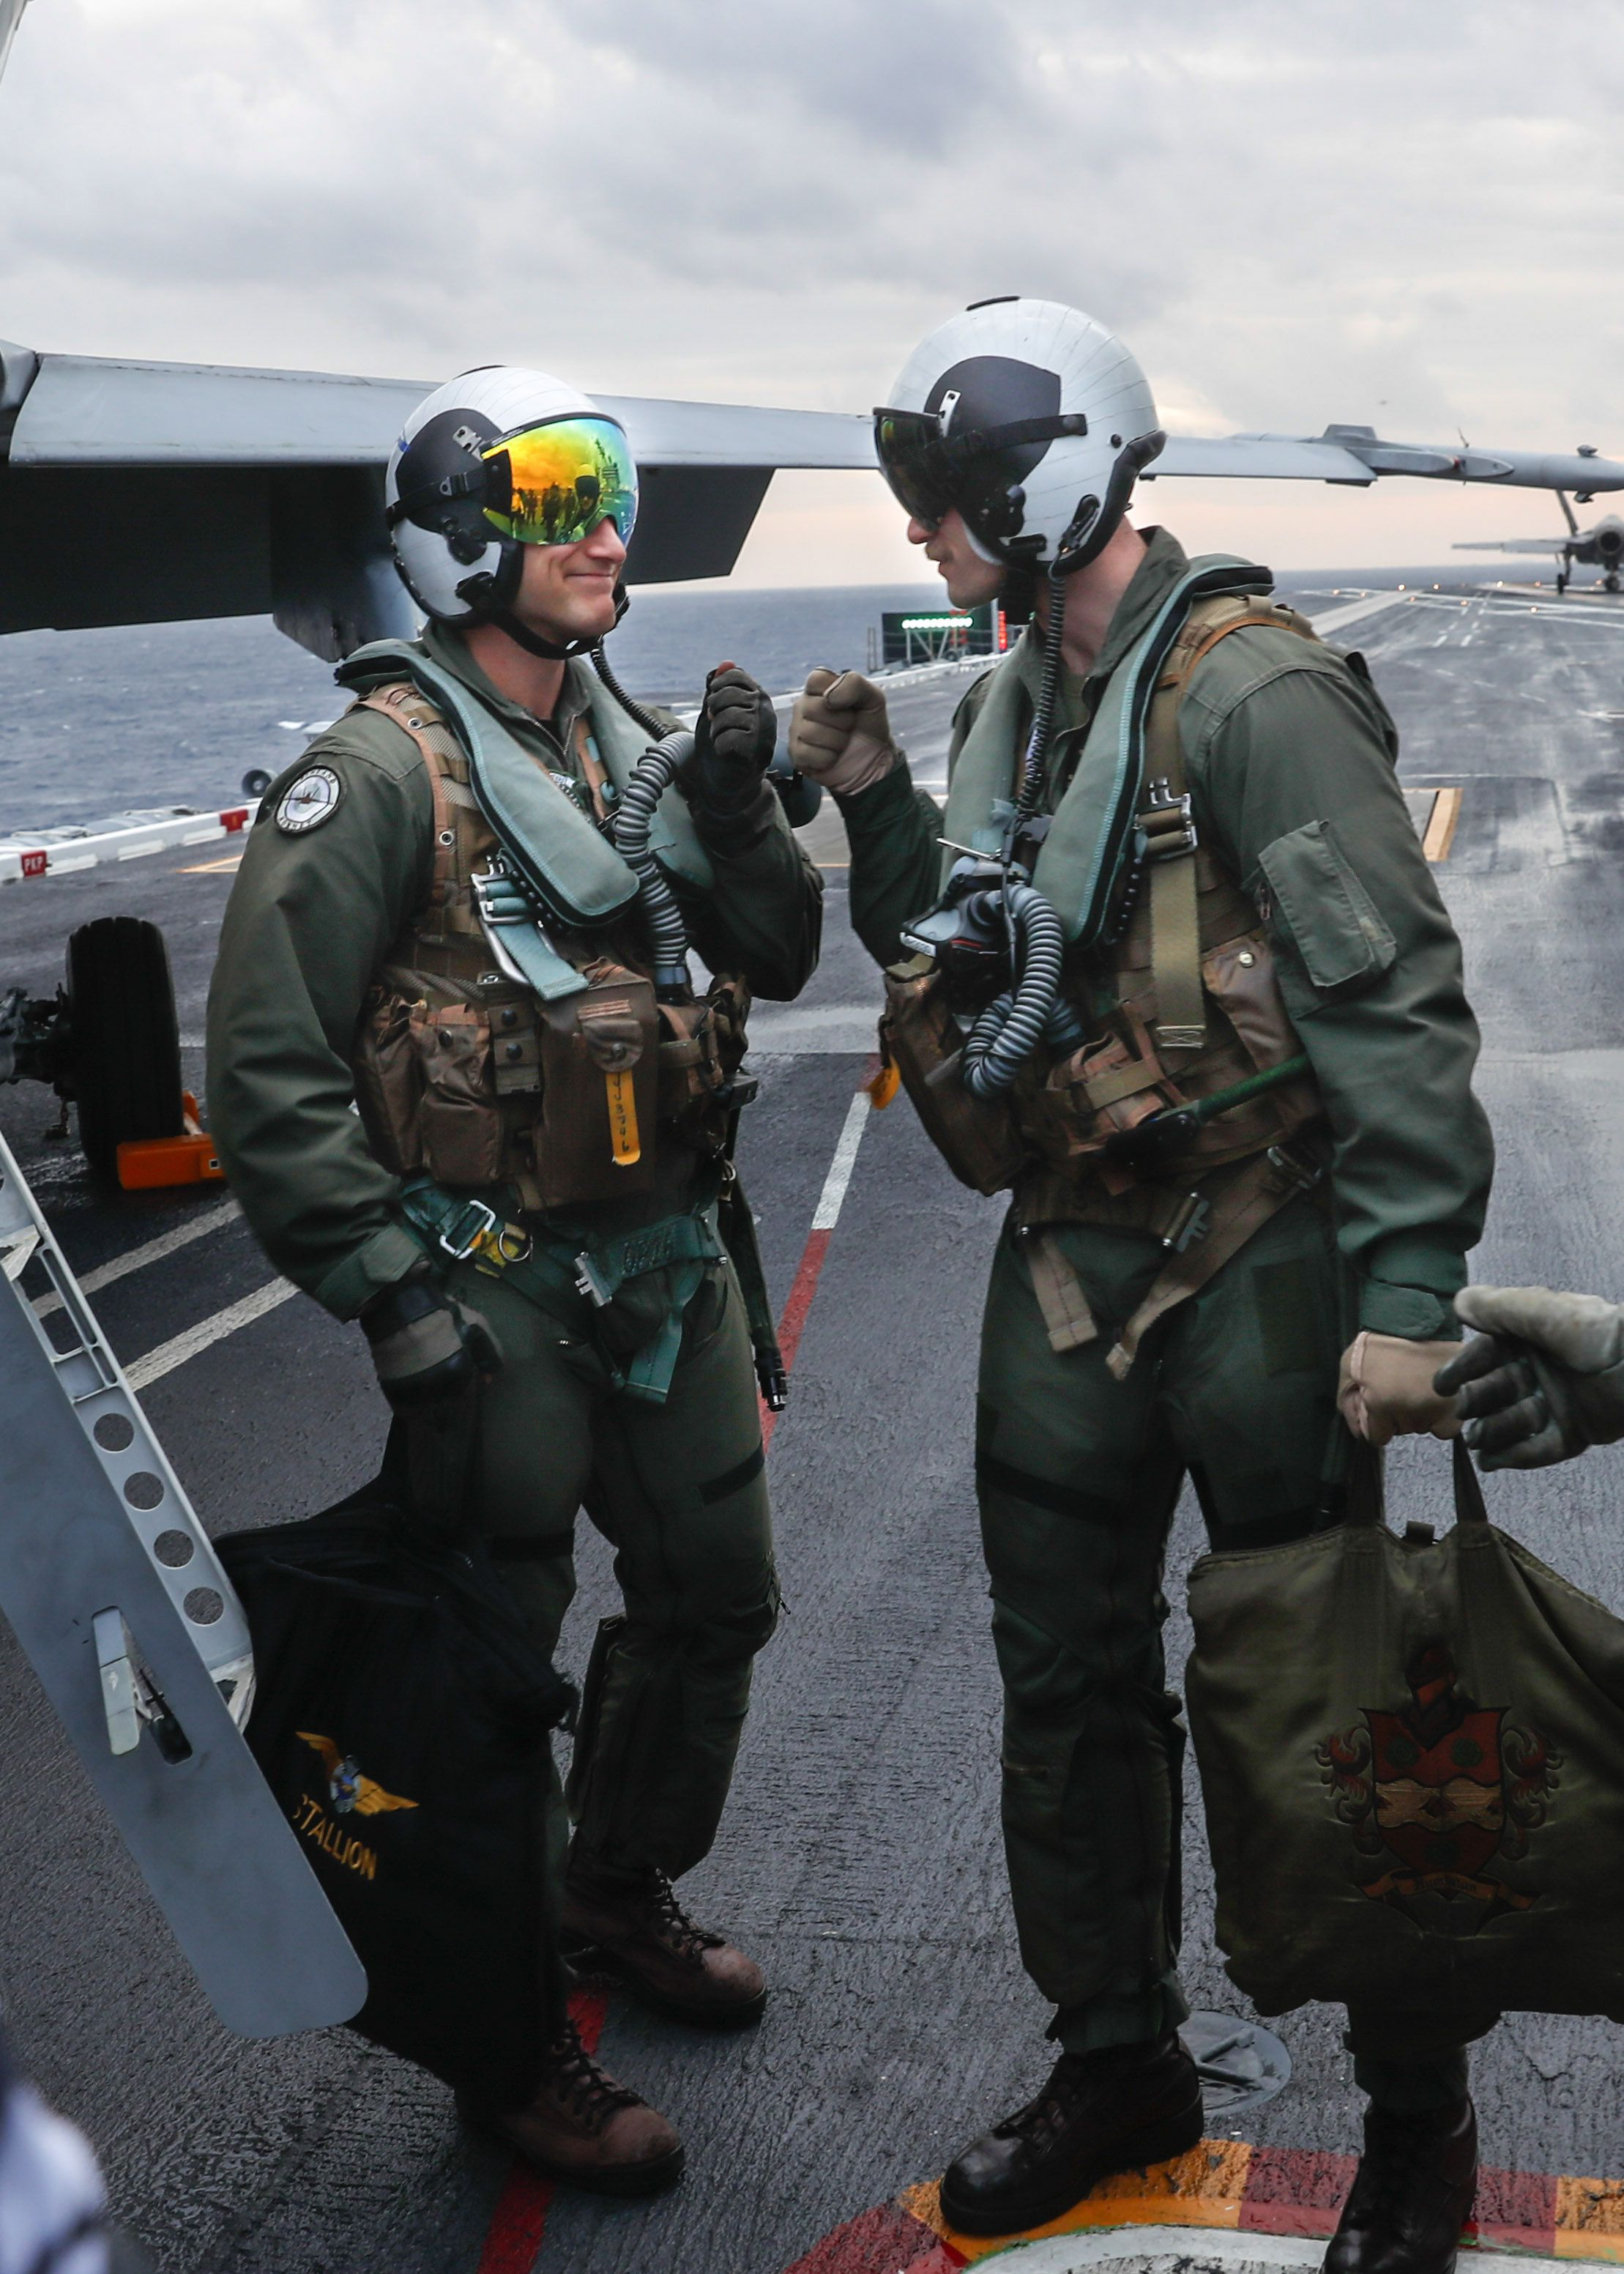 Finnish air force capt juha jarvinen being congratulated